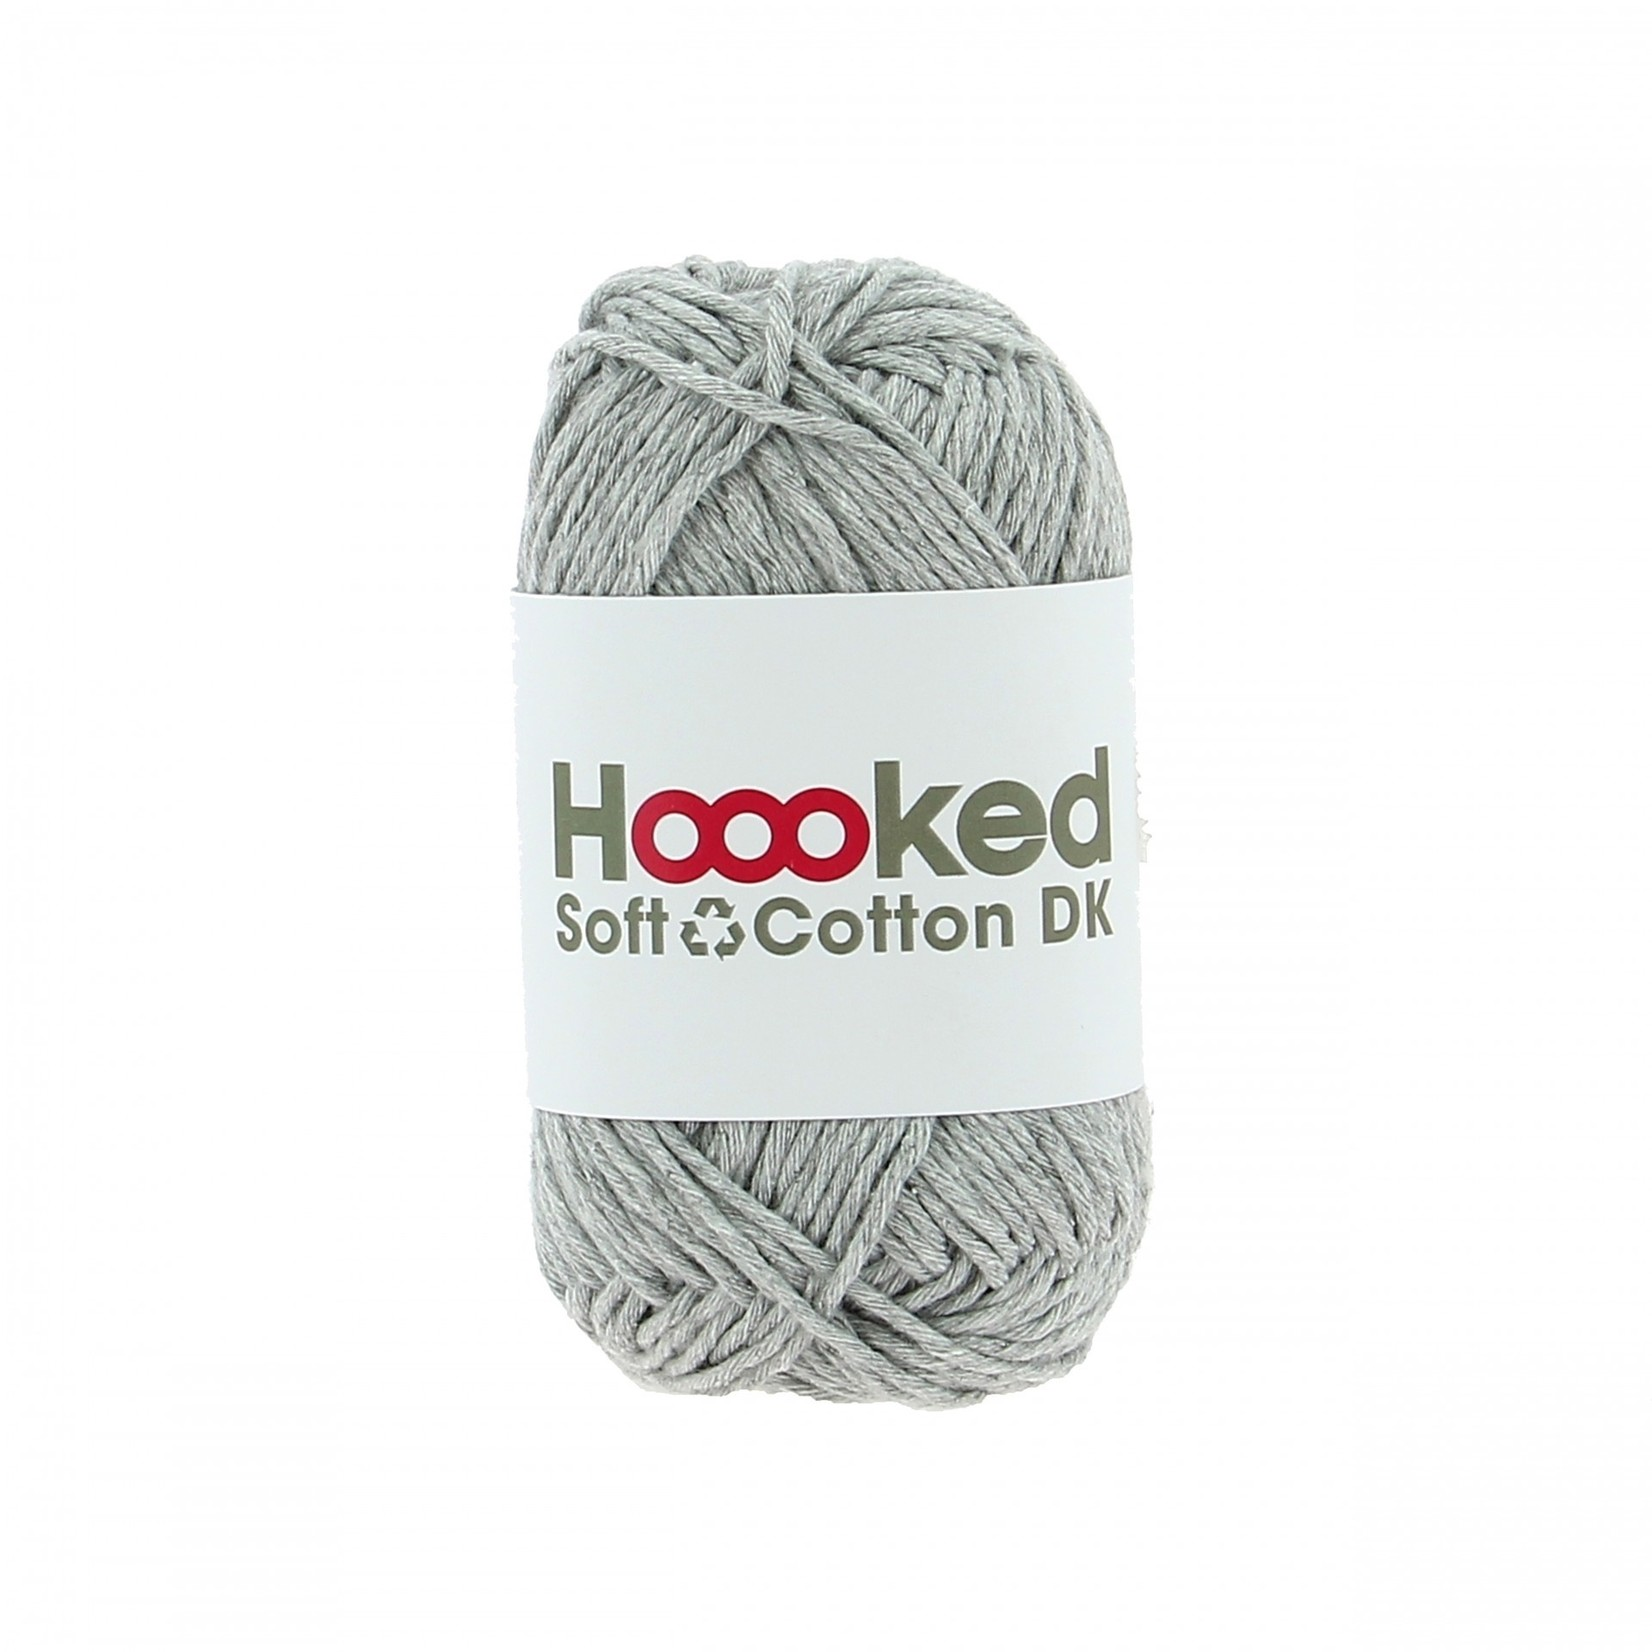 Hoooked Hoooked Soft Cotton DK New York Grey bundel 5 x 50 gr. / 85 m.